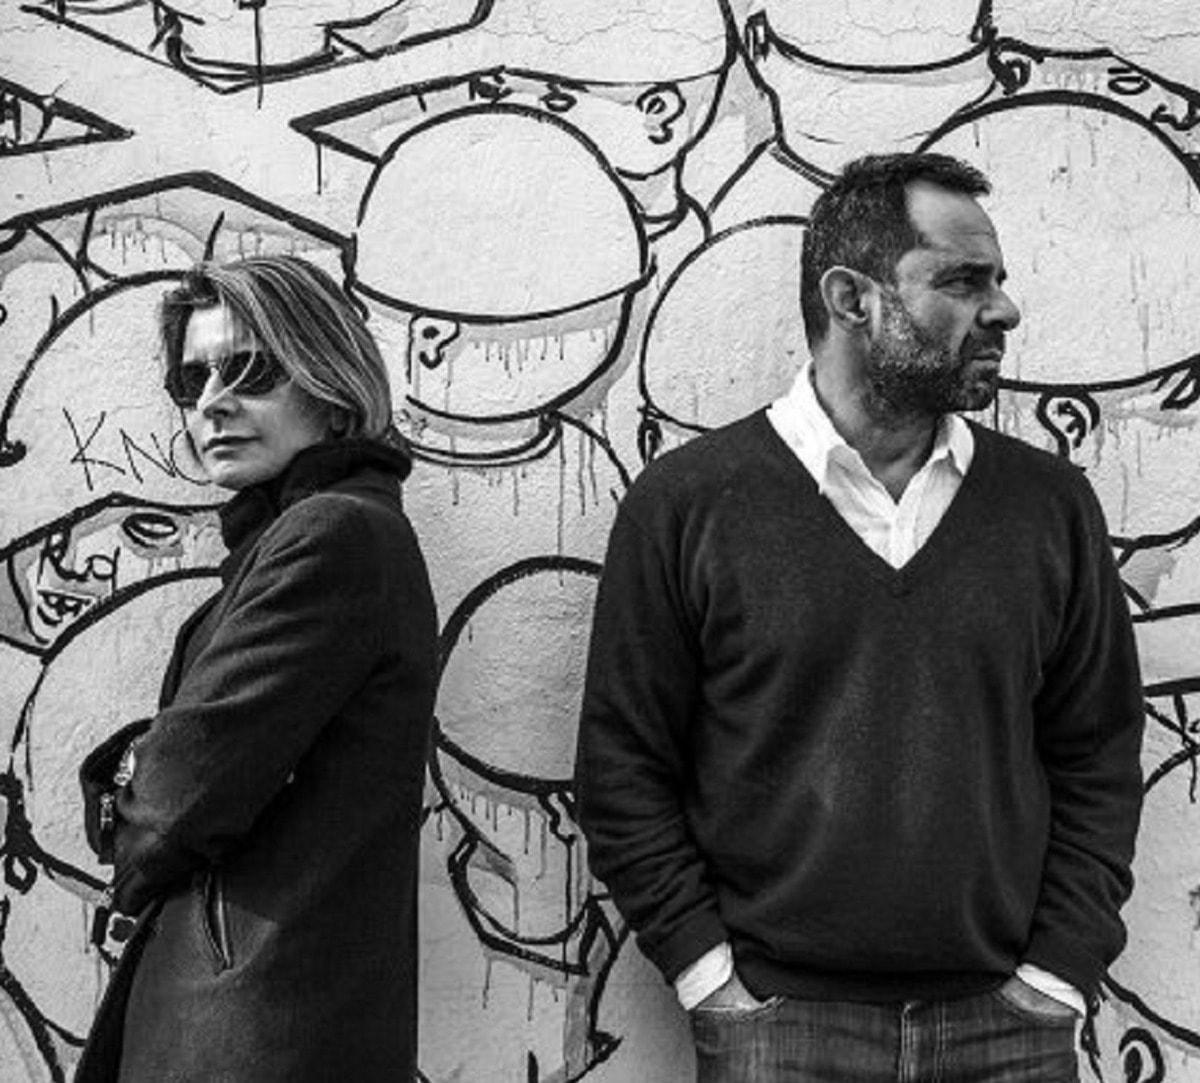 Ludovica + Robeto Palomba kartell by laufen